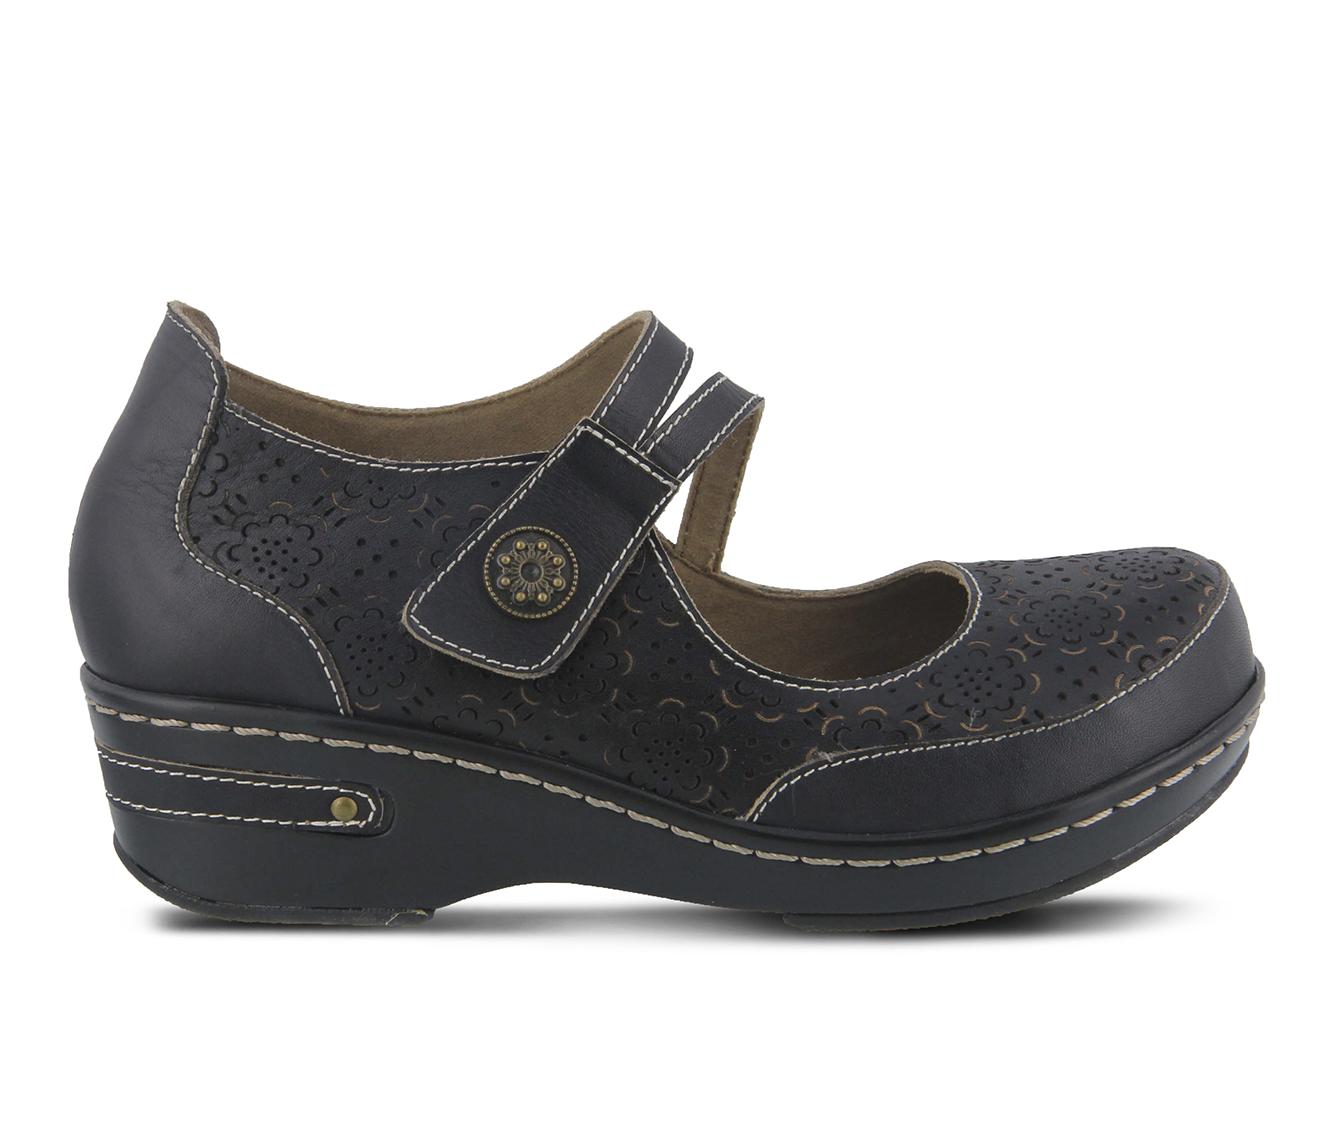 L'Artiste Mamata Women's Shoe (Black Leather)